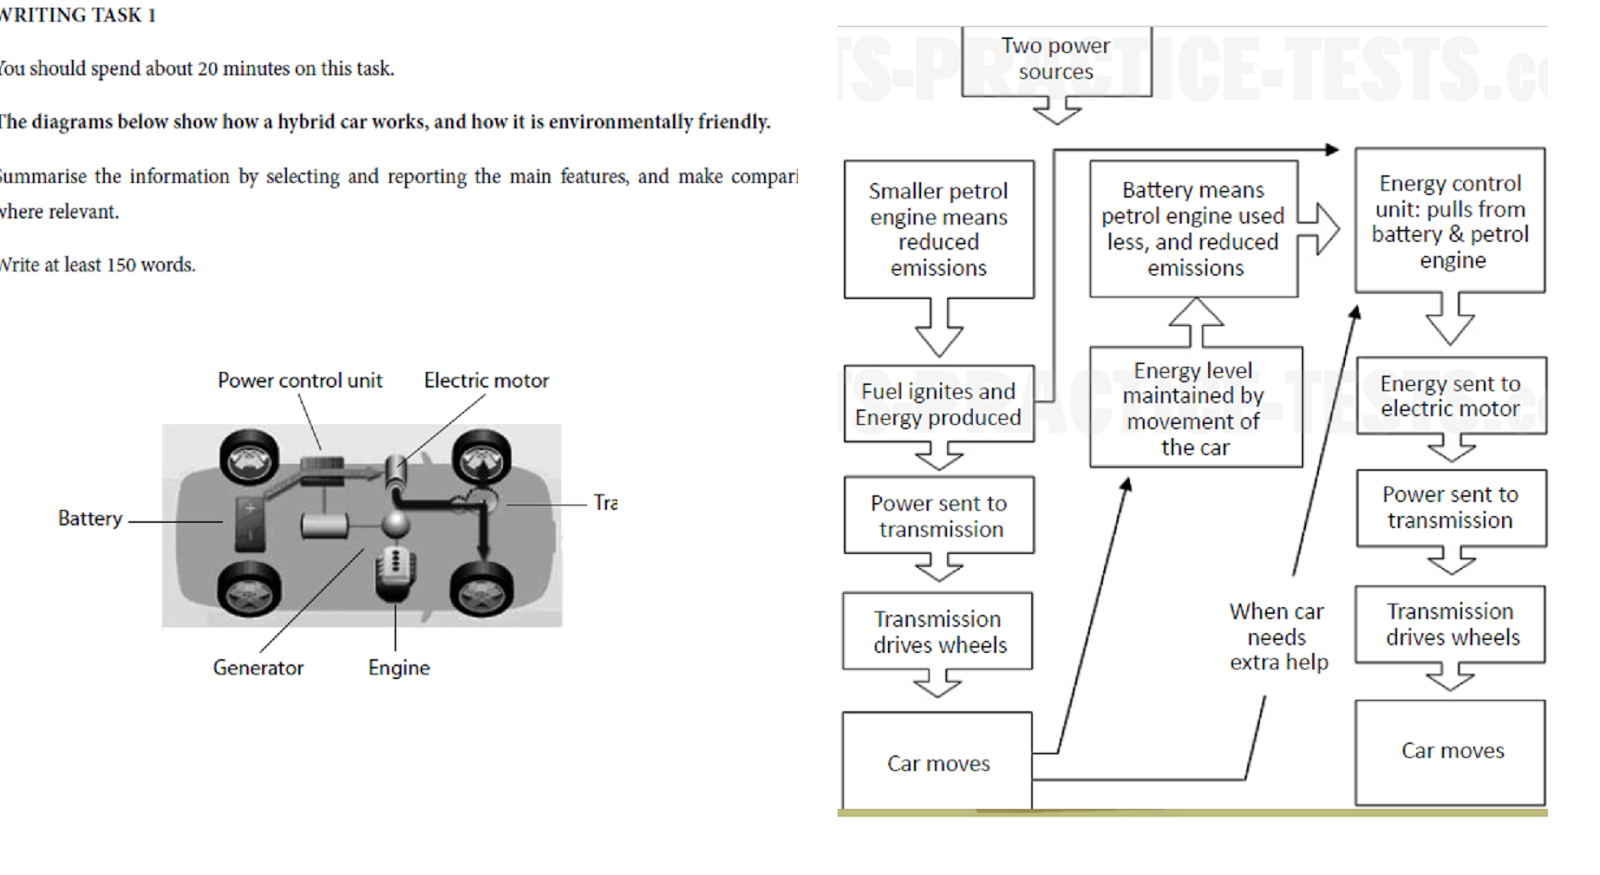 hybrid car flow chart ielts task 1 band 7 [ 1600 x 875 Pixel ]